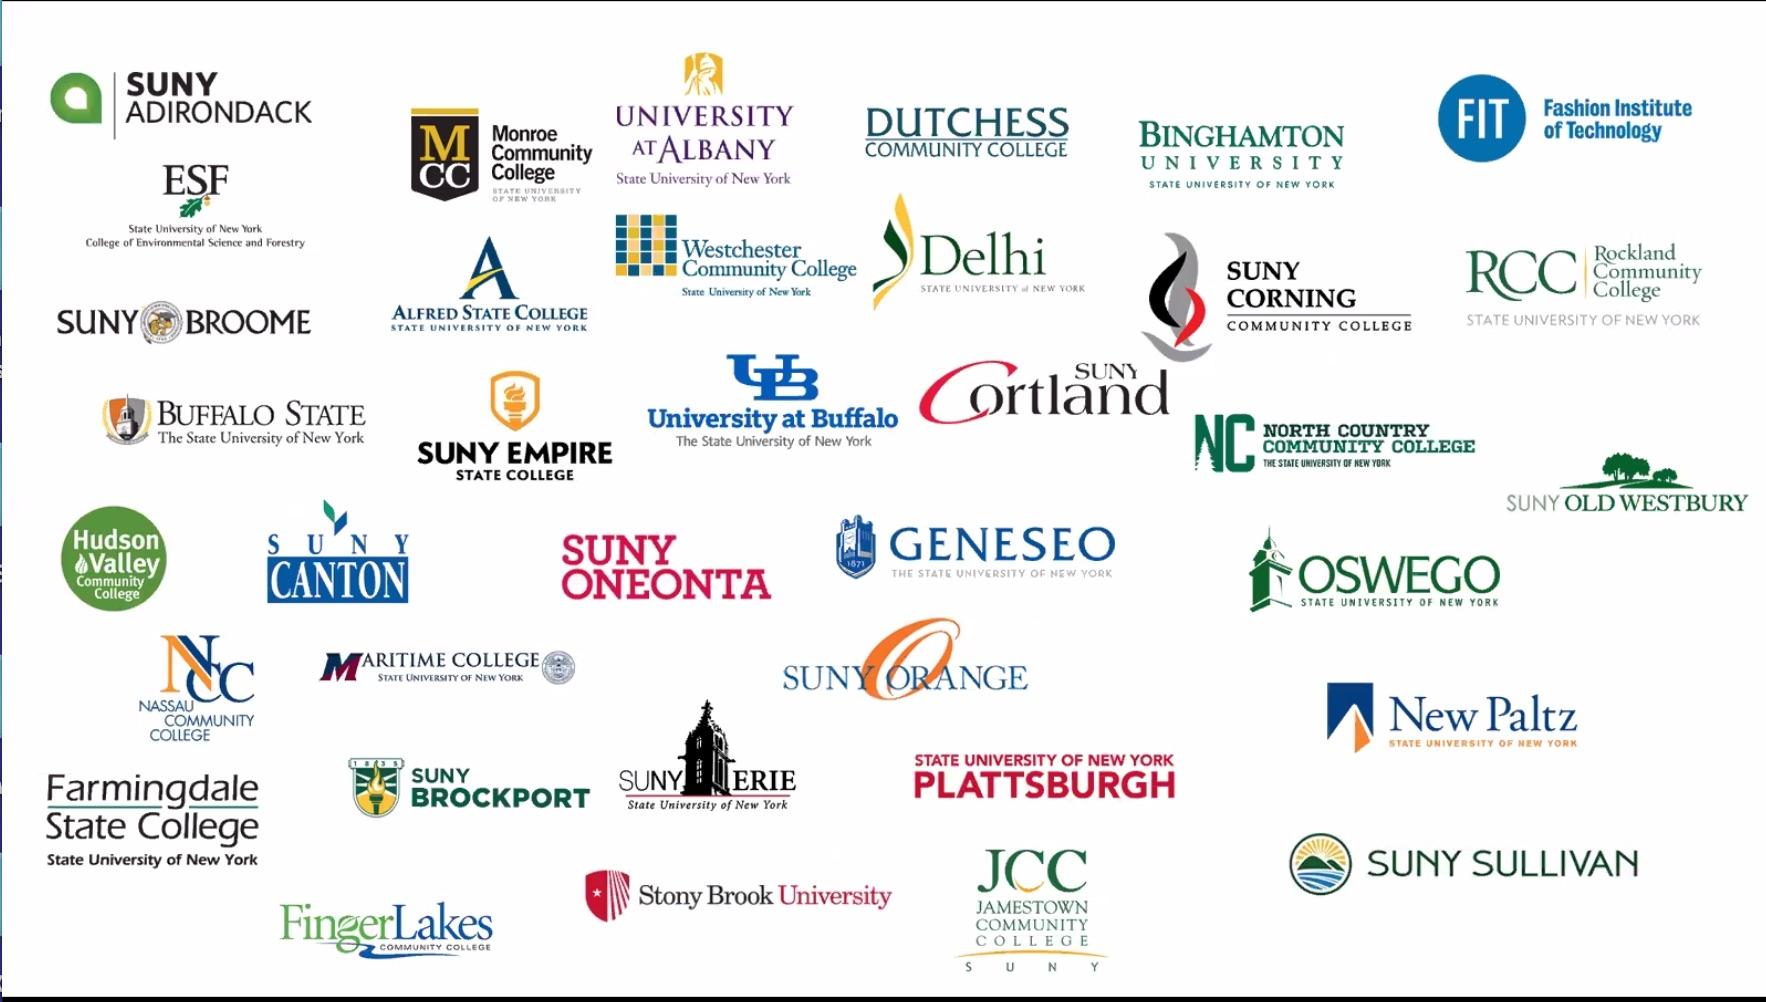 SUNY system campus logos